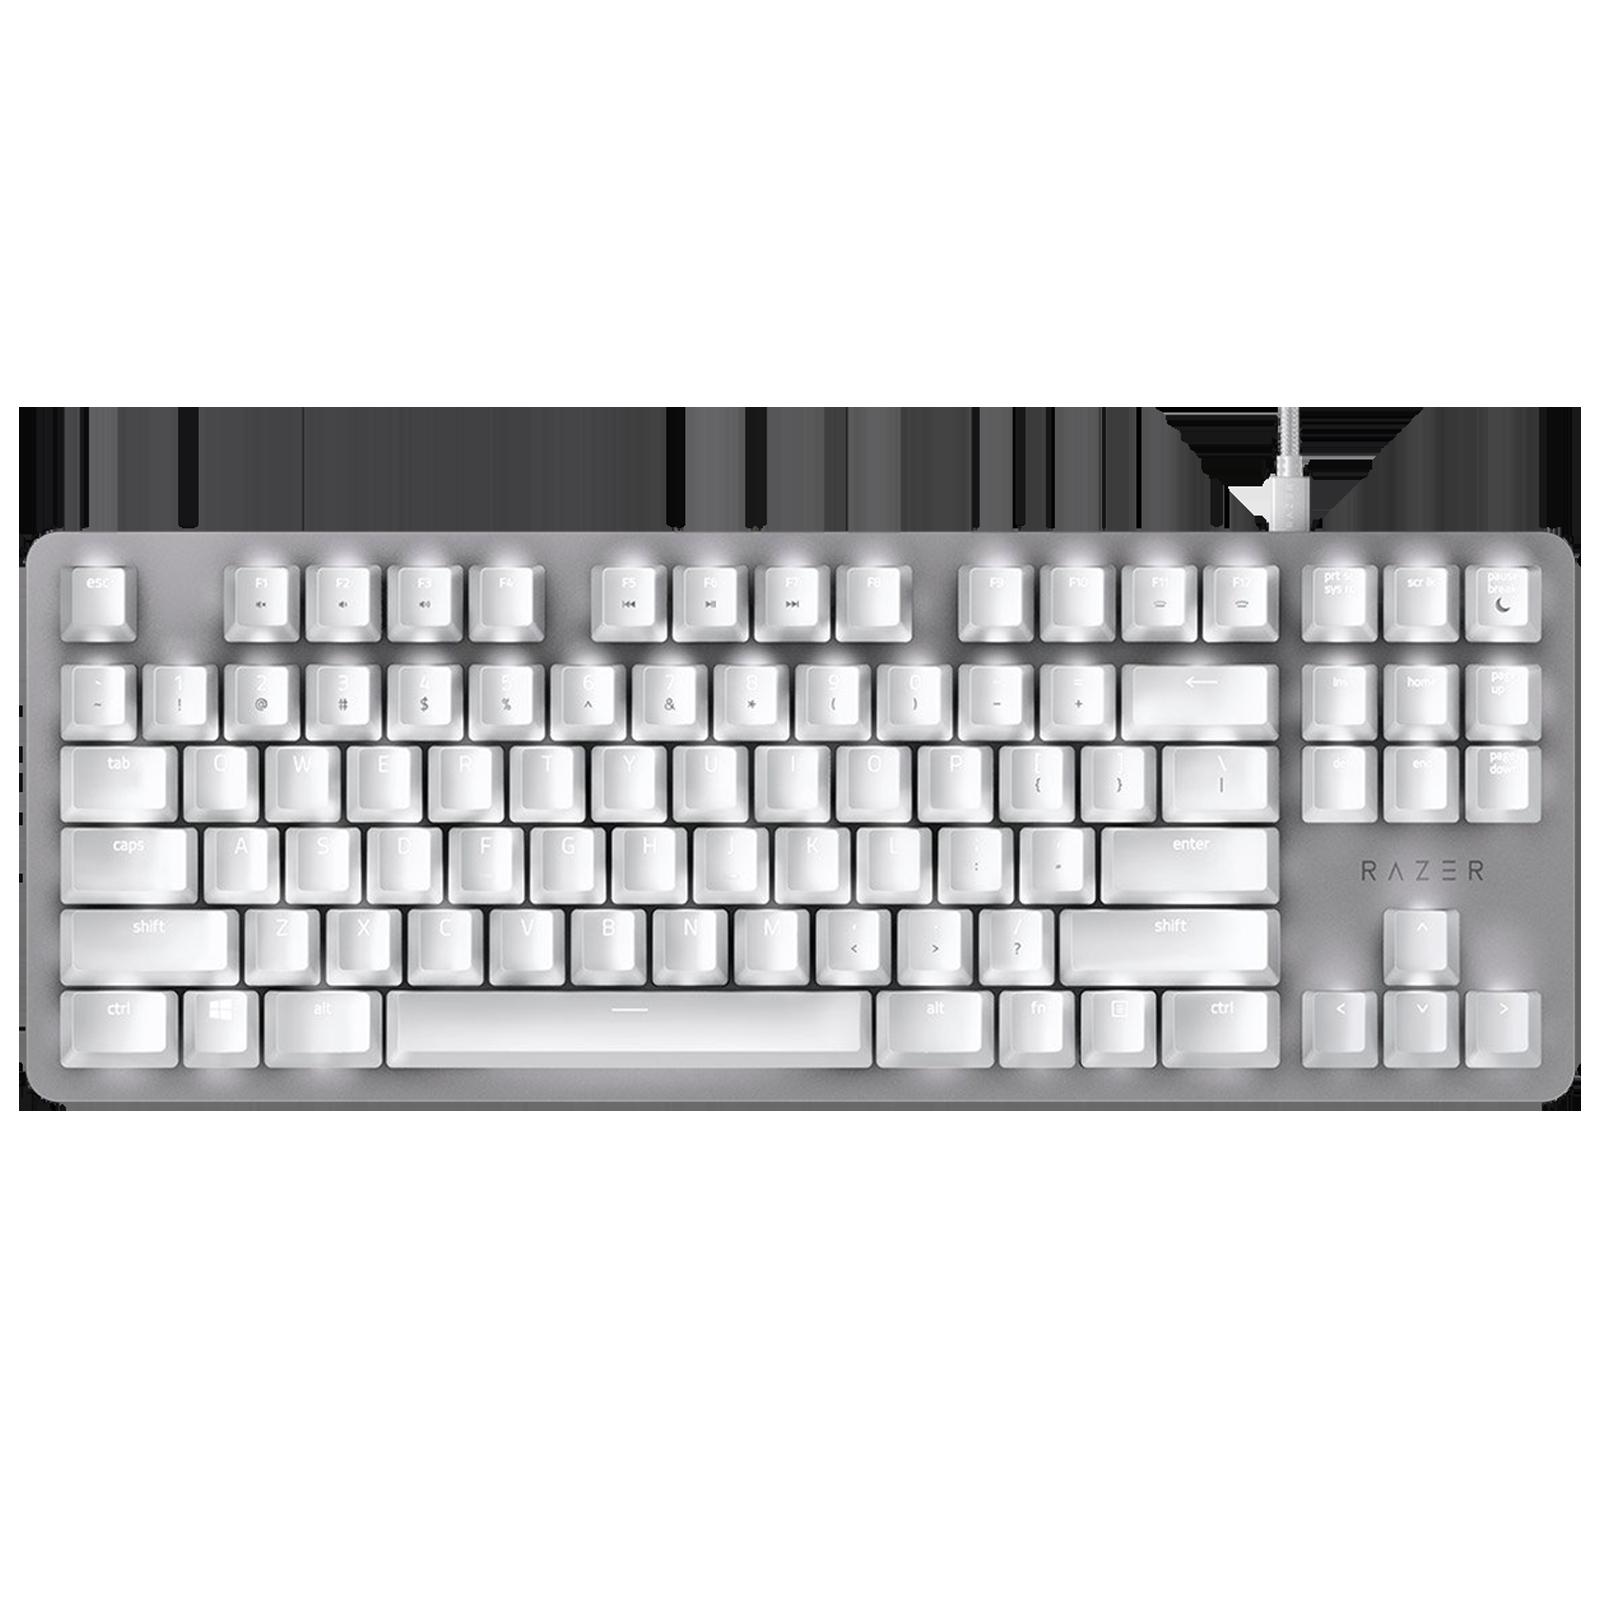 Razer BlackWidow Lite Wired Gaming Keyboard (Orange Mechanical Switch, RZ03-02640700-R3M1, Mercury)_1